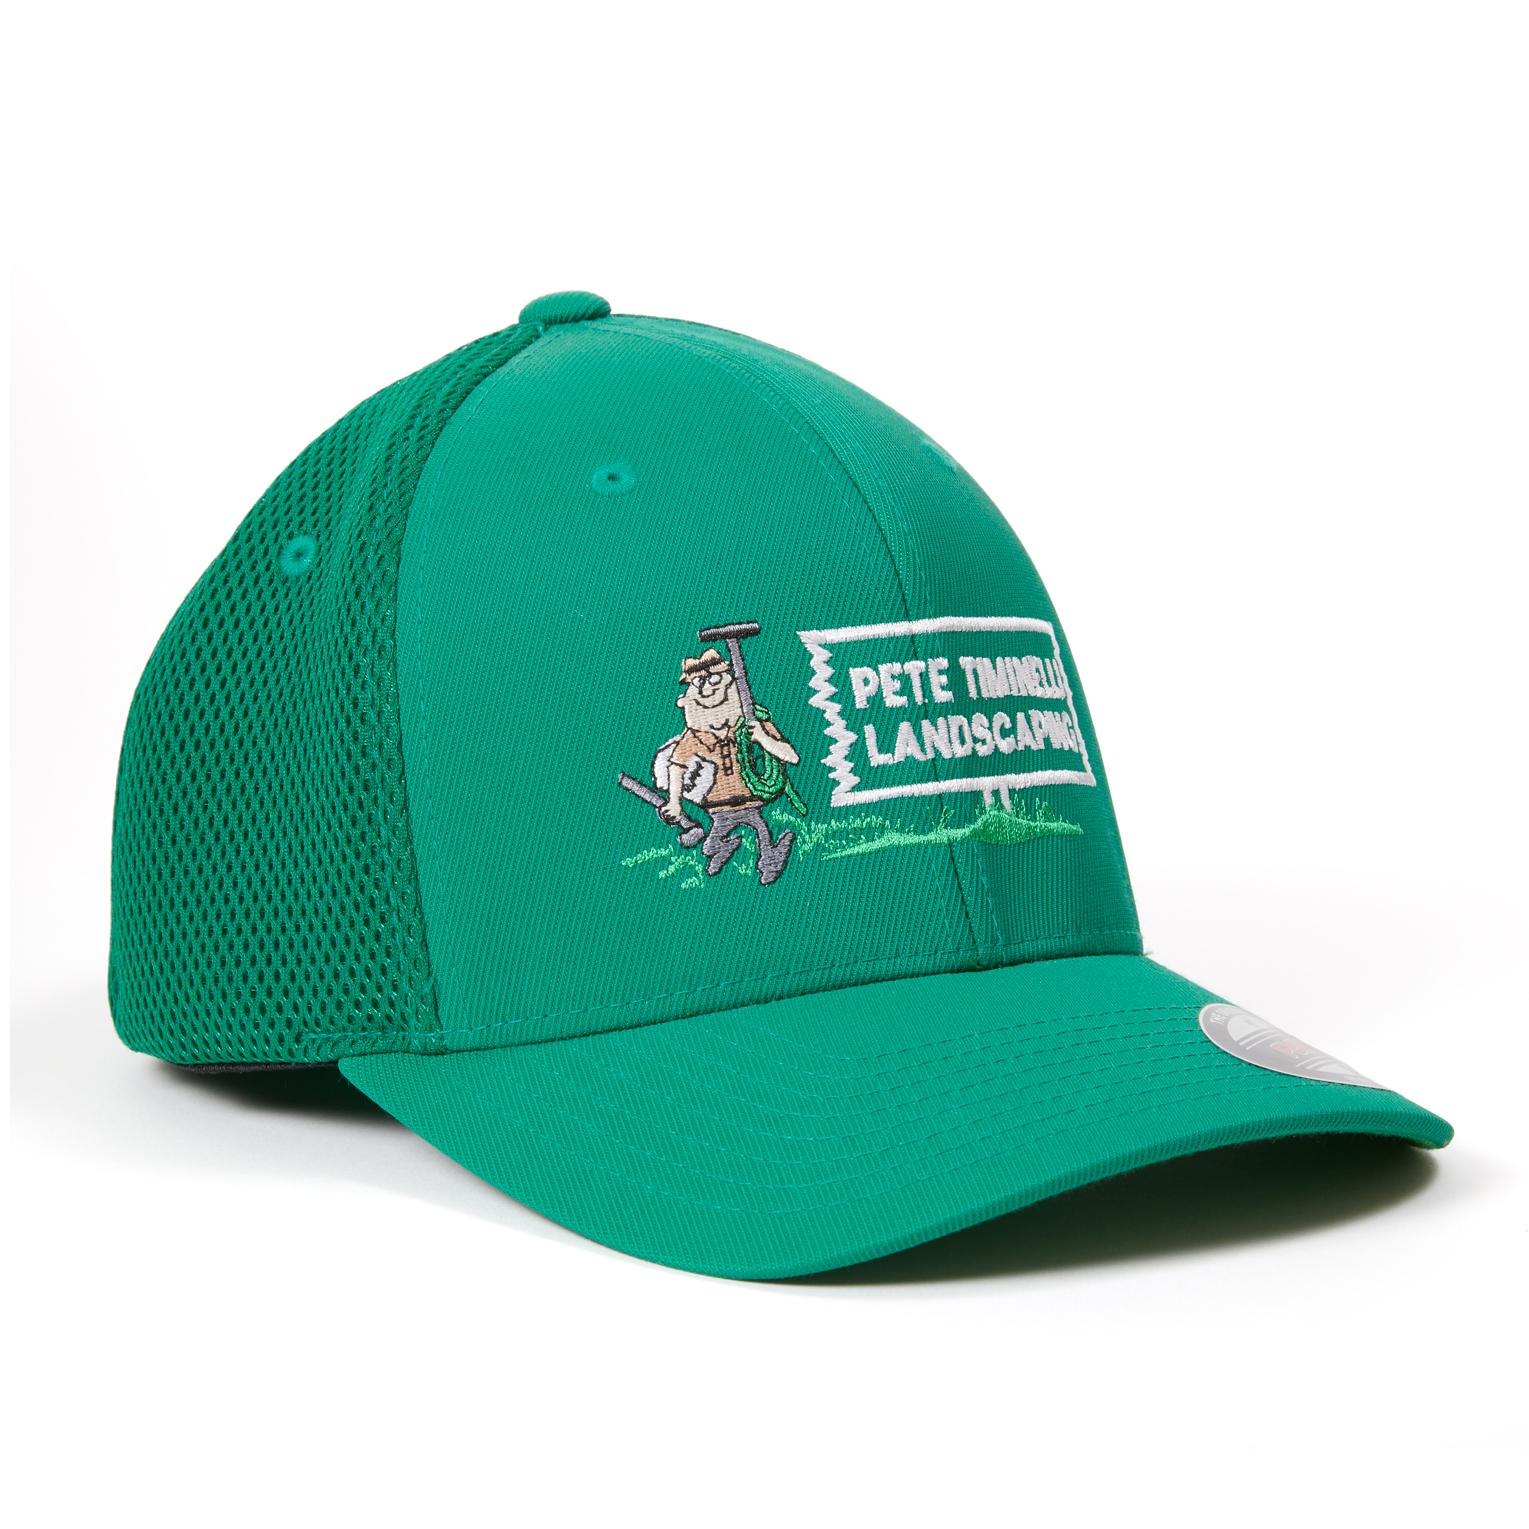 landscaping-hat